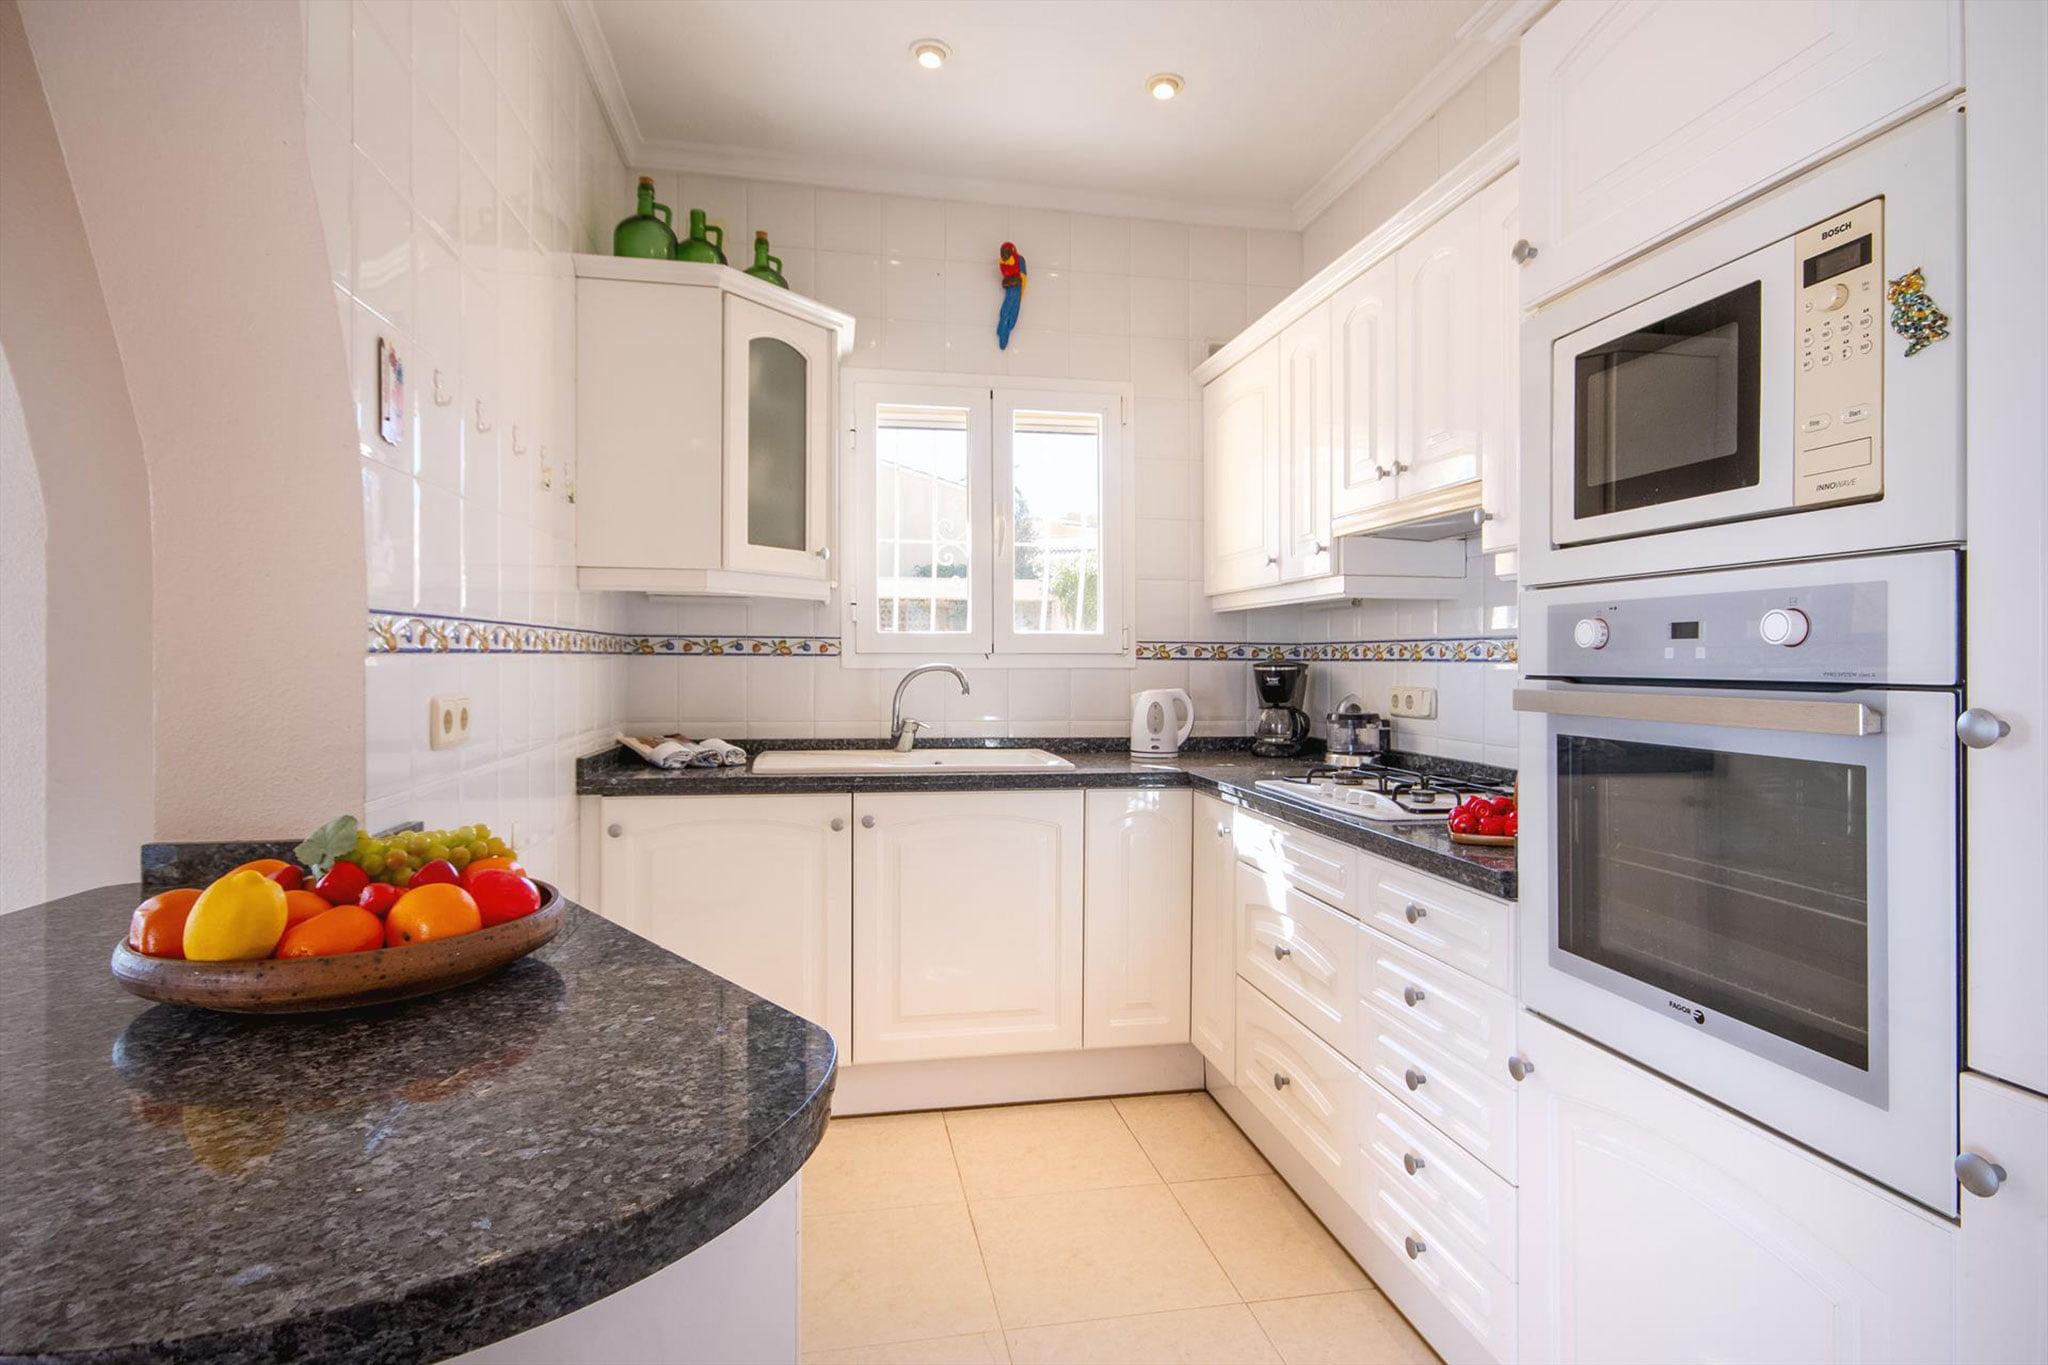 Cocina de una casa de alquiler de vacaciones en Benitachell – Aguila Rent a Villa